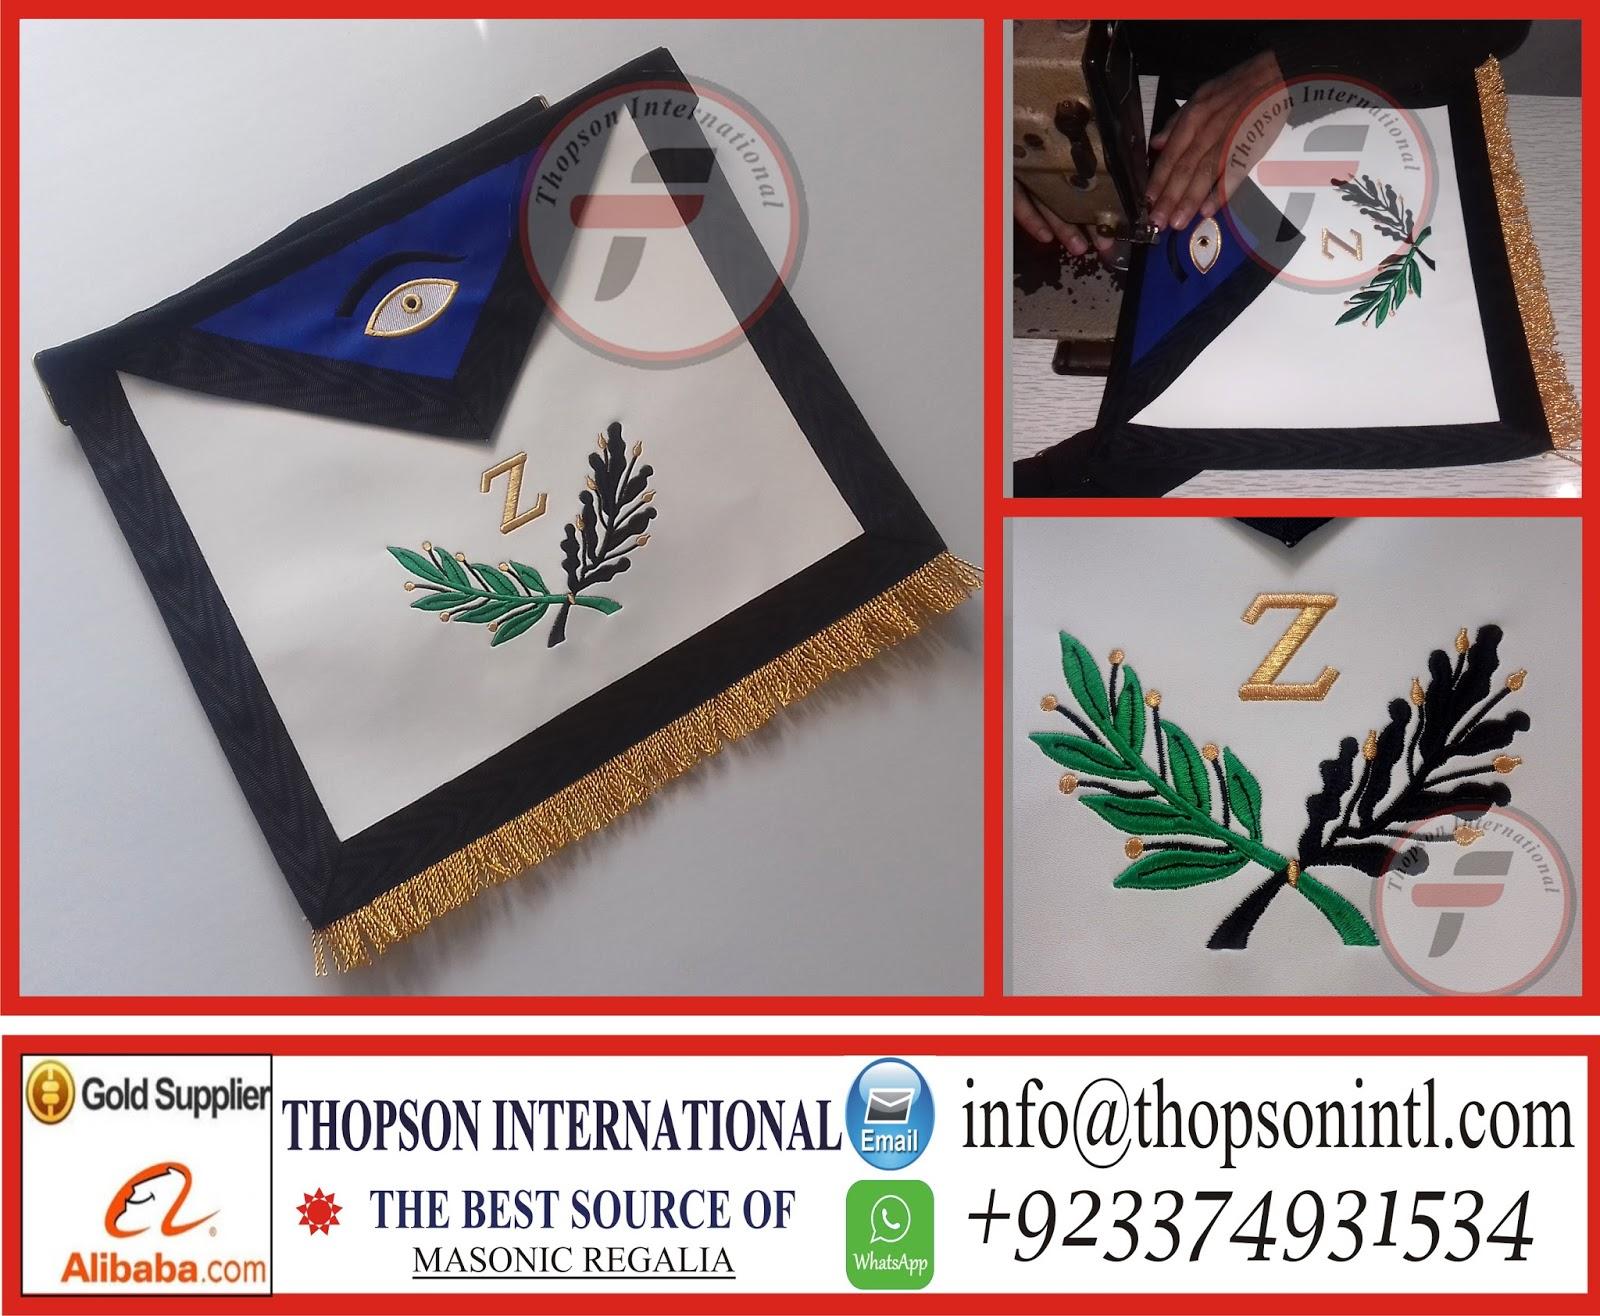 Masonic Regalia thopson: Masonic AASR 4 degree Apron & collar set